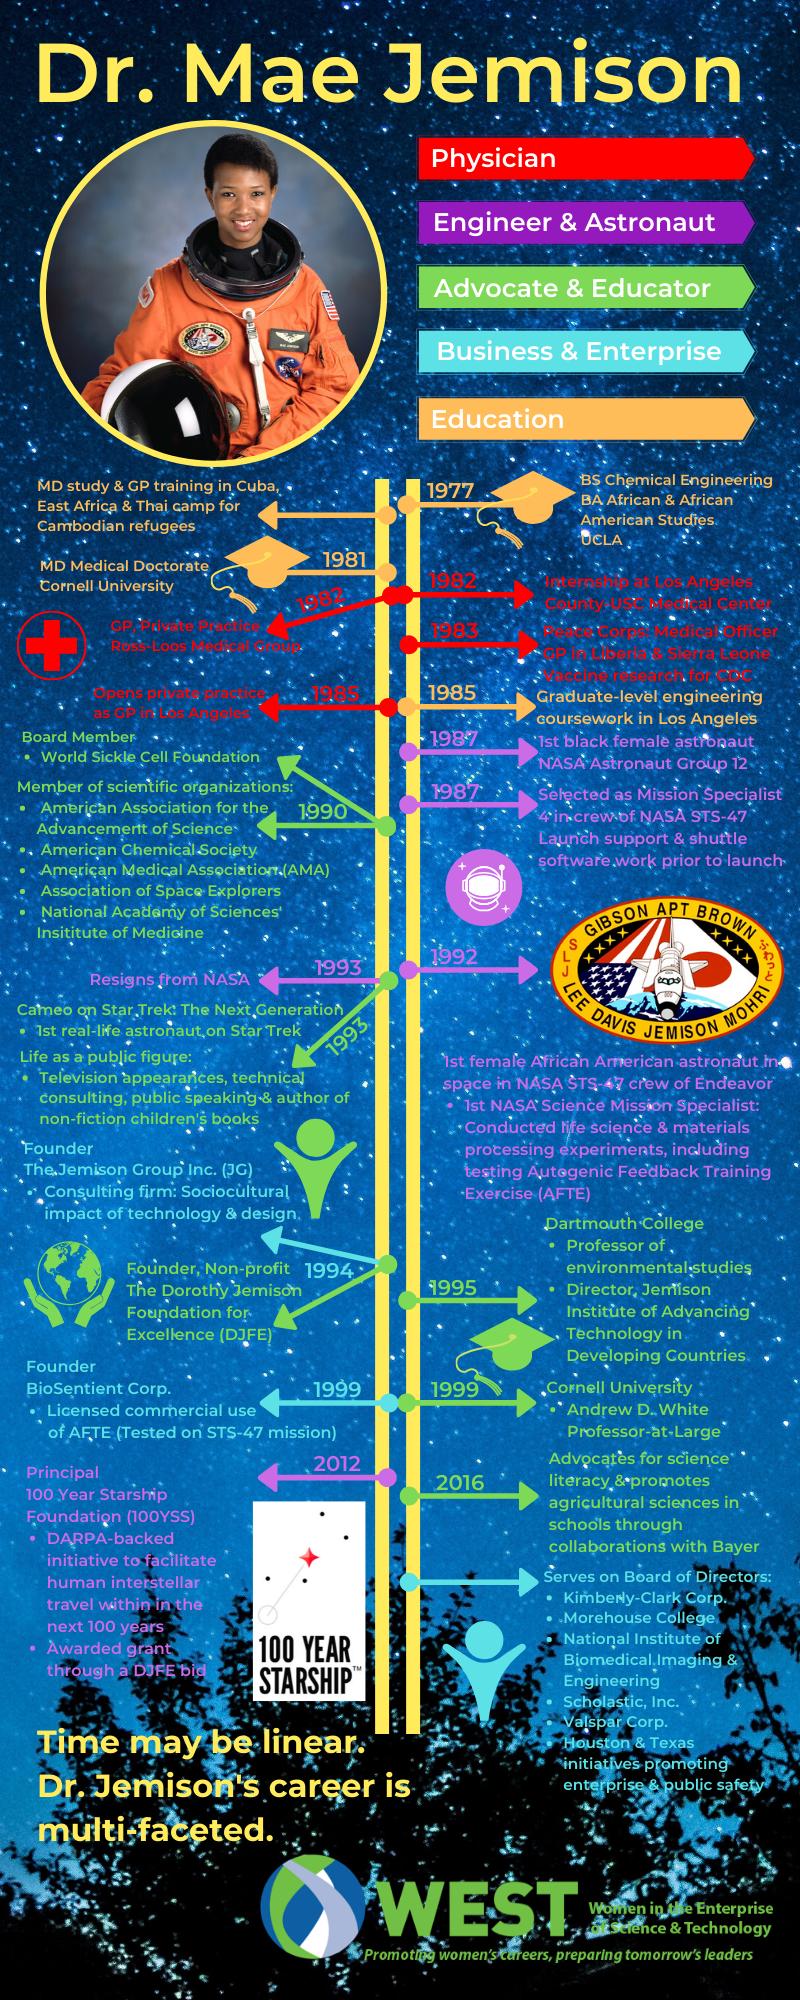 191107-WEST-infographic-Dr. Mae Jemison